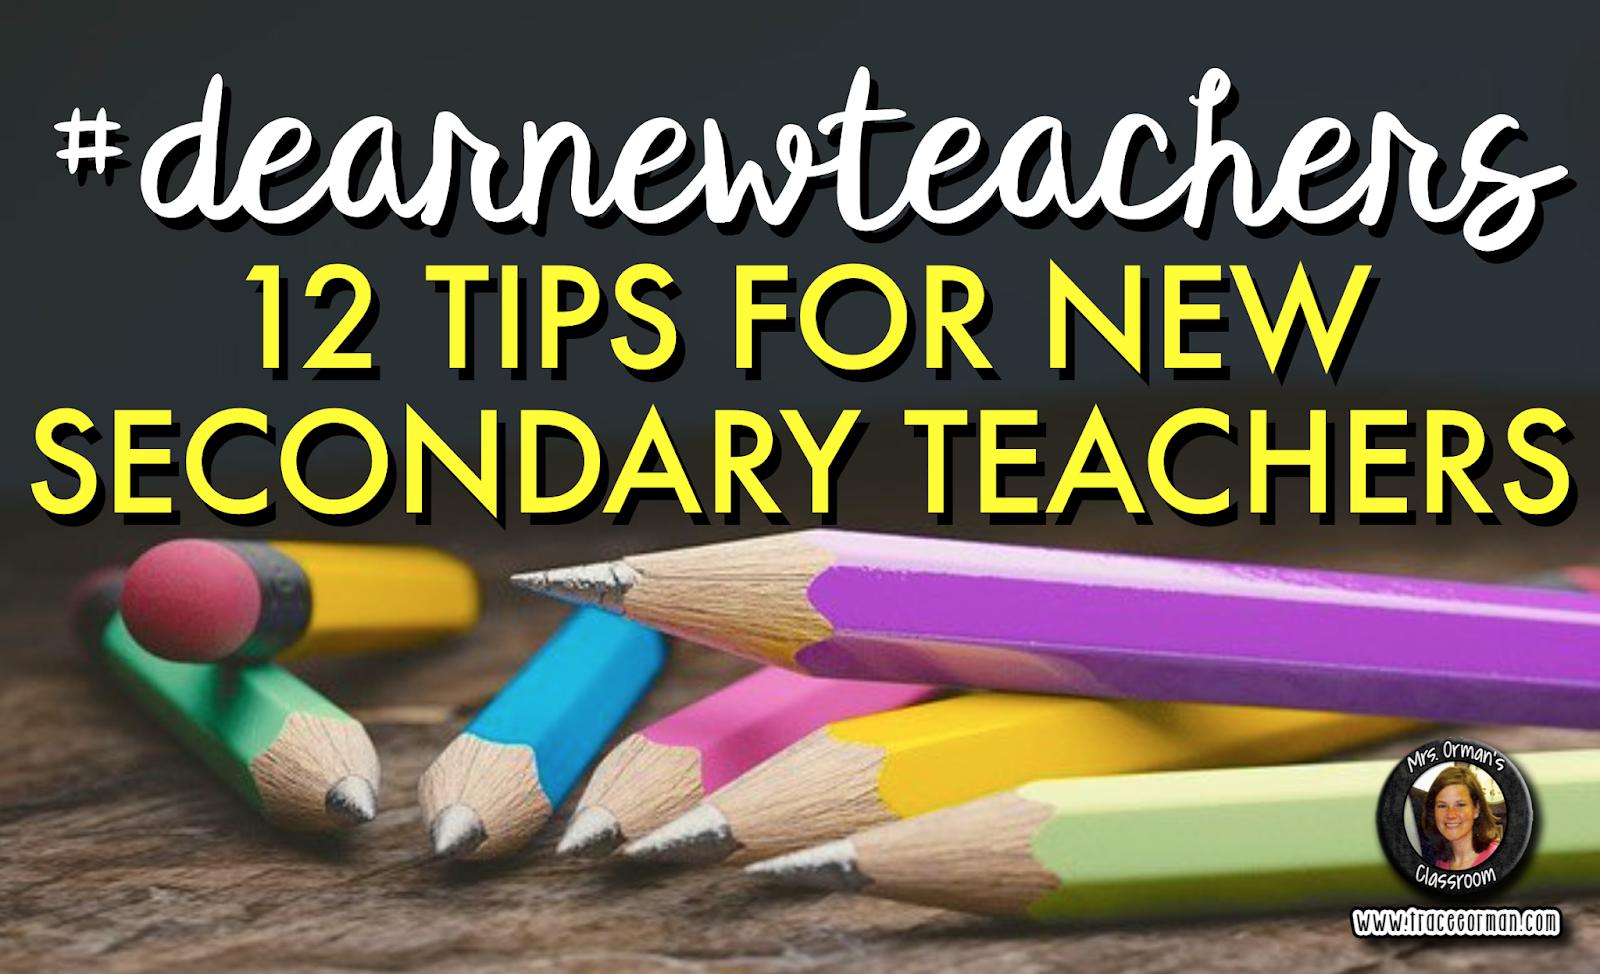 12 tips for new teachers  www.traceeorman.com